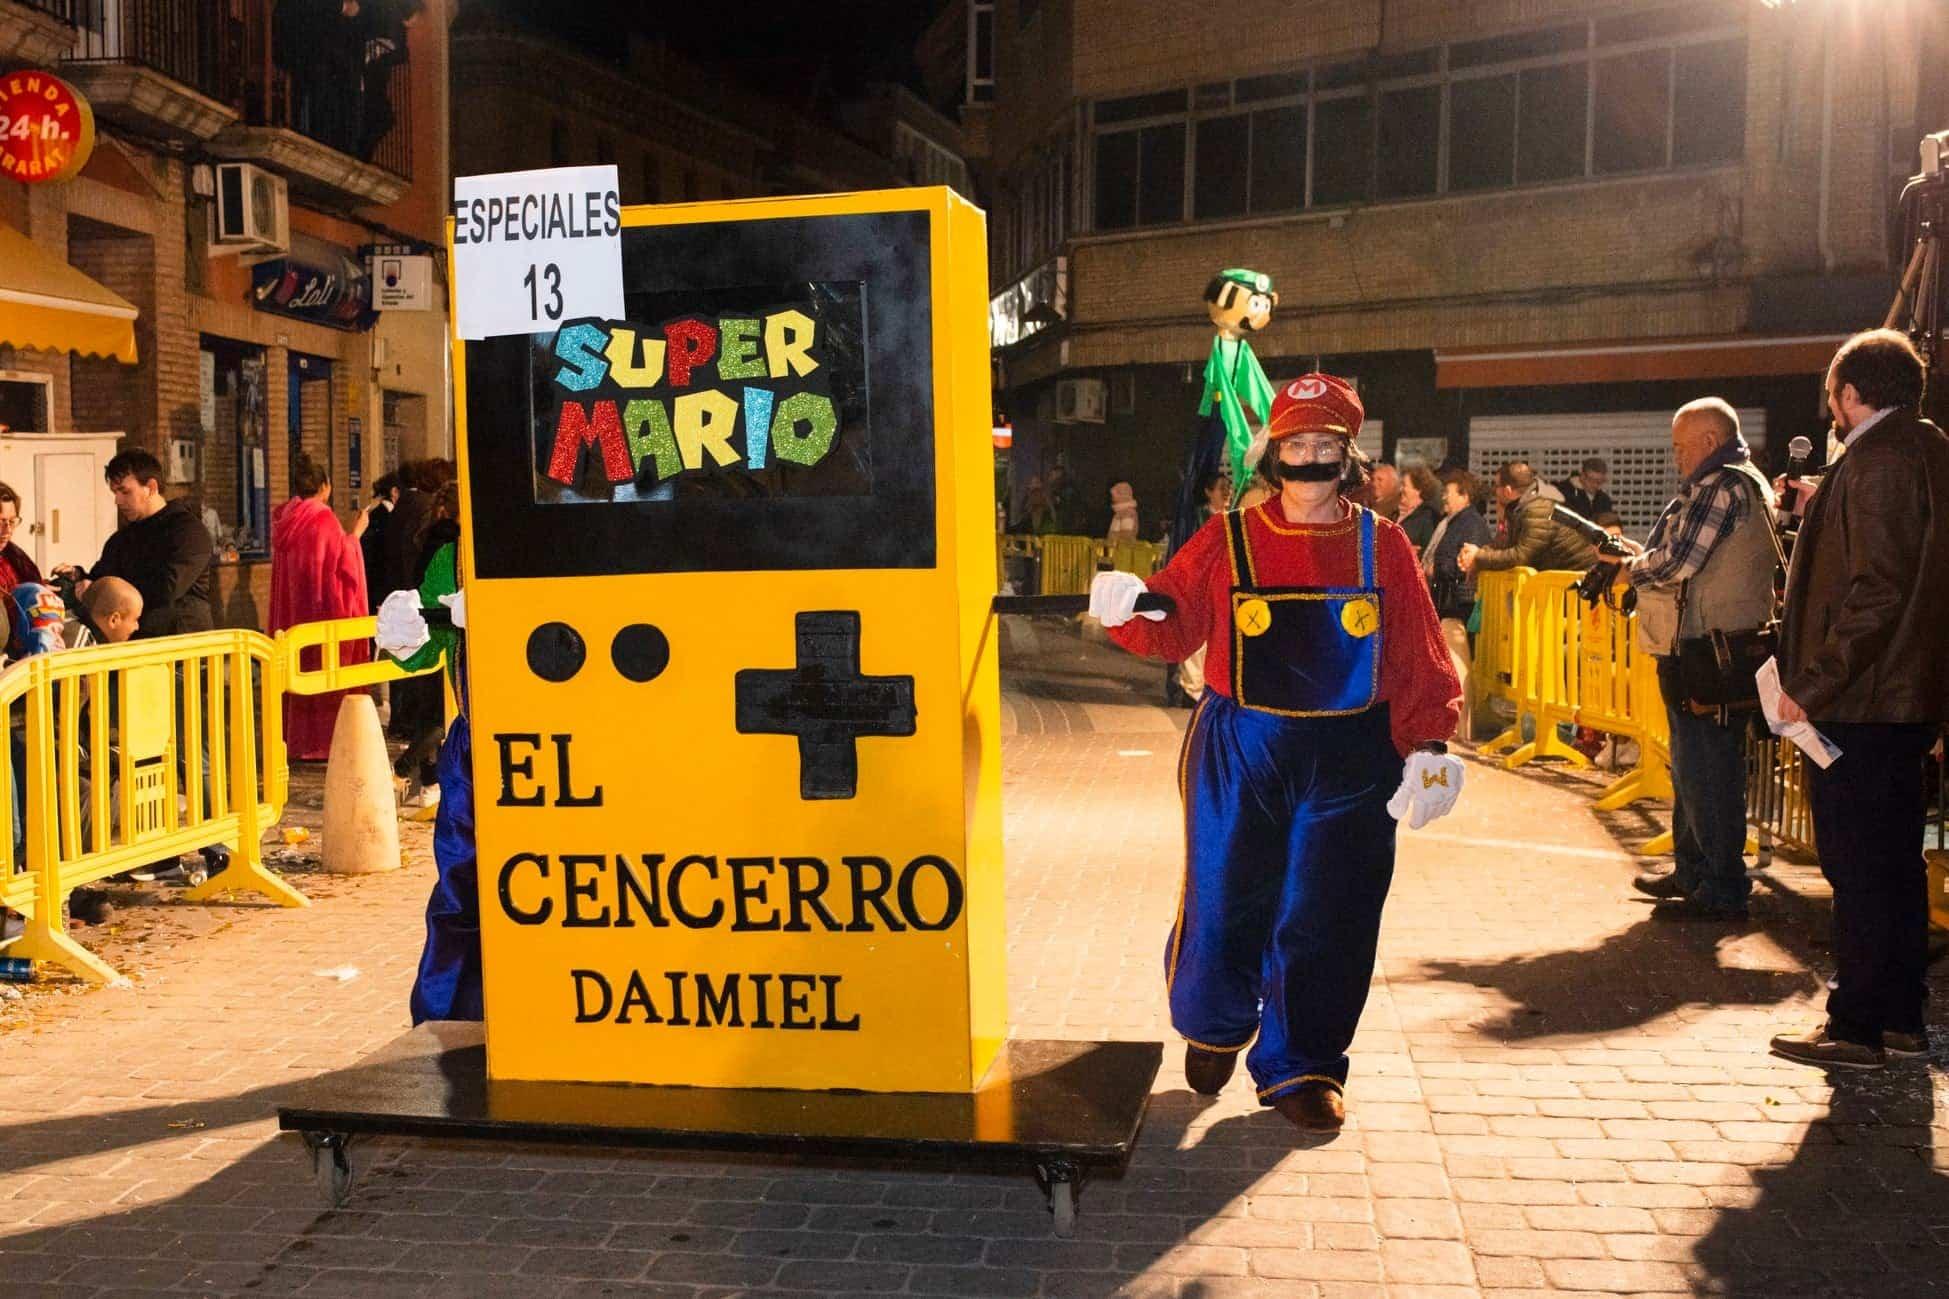 Carnaval de herencia 2020 ofertorio 18 - Selección de fotografías del Ofertorio del Carnaval de Herencia